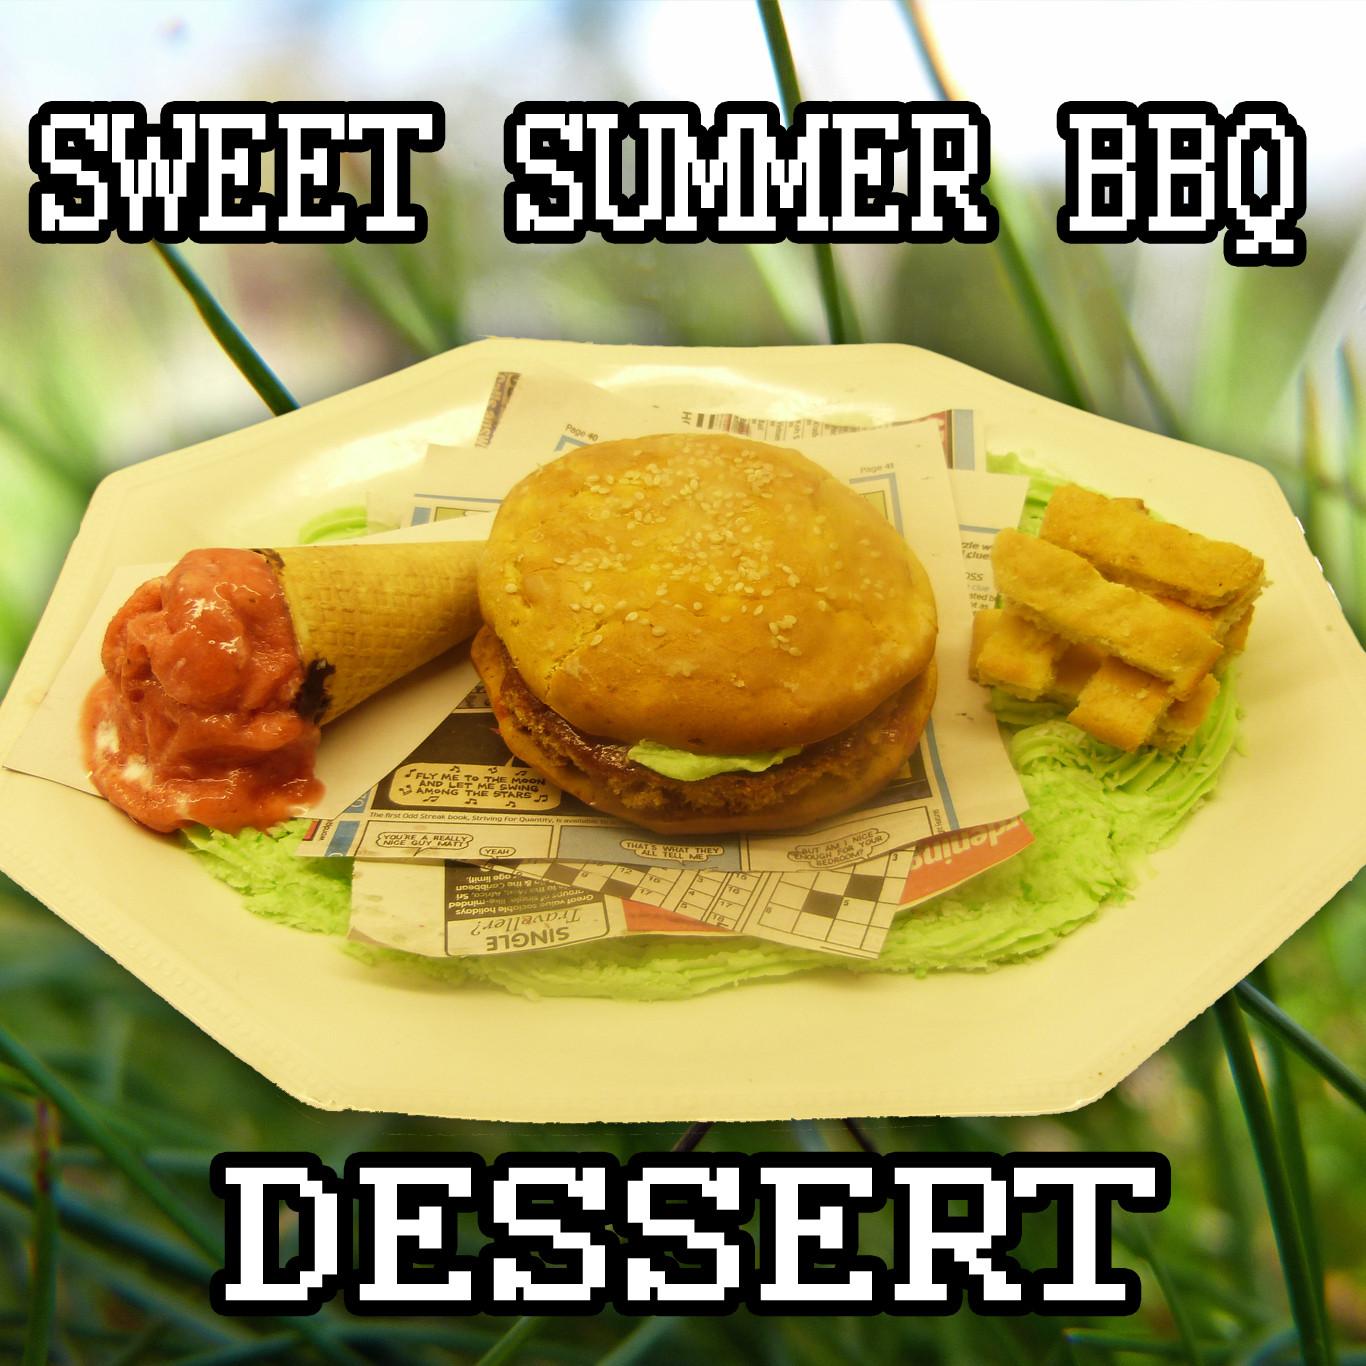 Summer Bbq Desserts  Sweet Summer BBQ Dessert